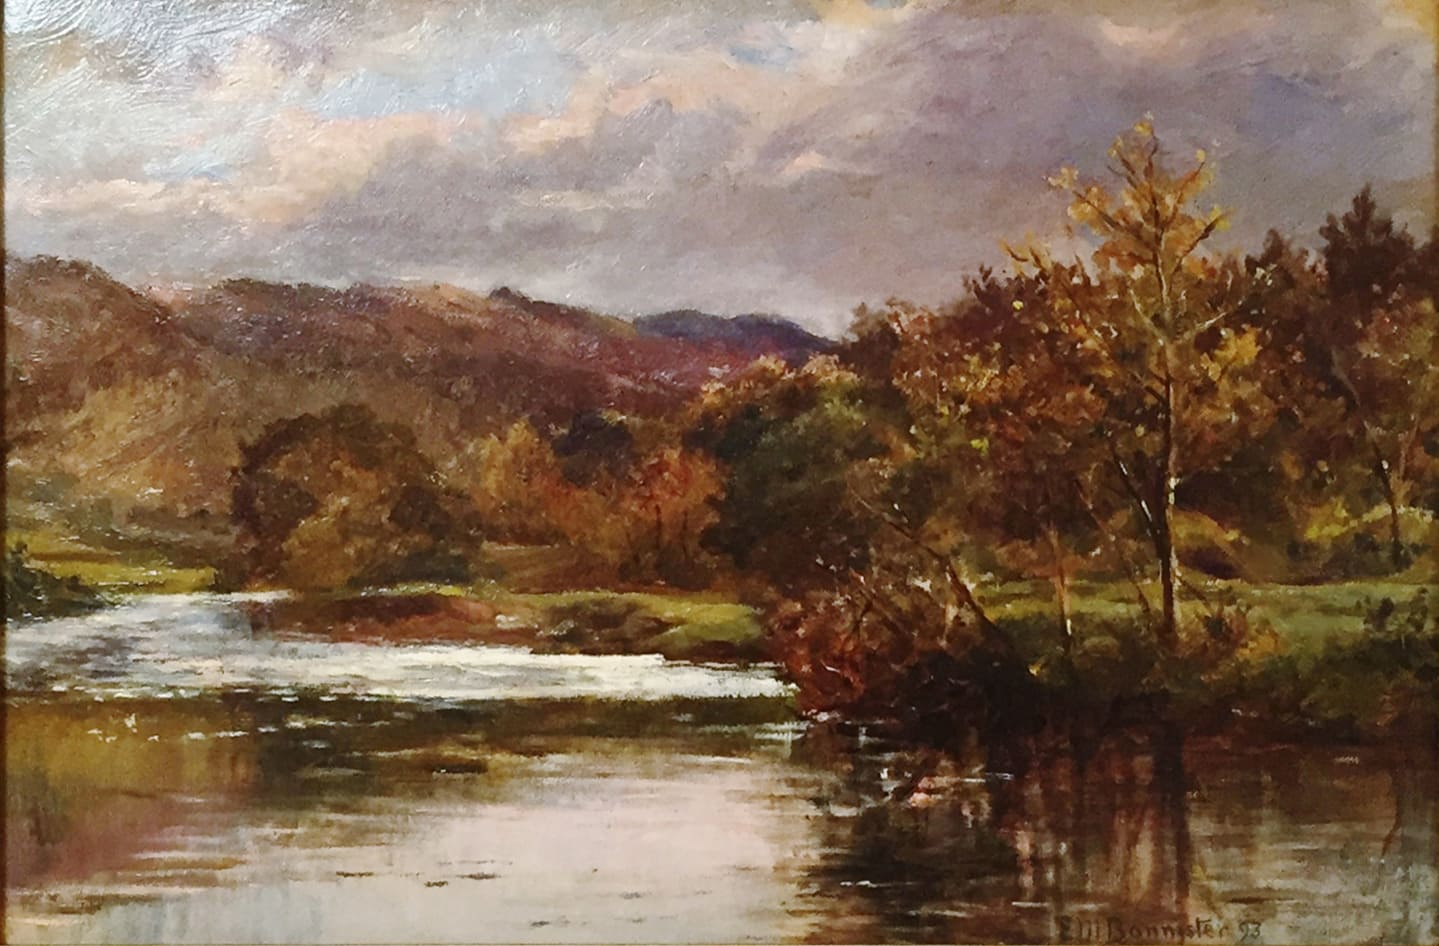 Edward Mitchell Bannister, Untitled Landscape, c.1880